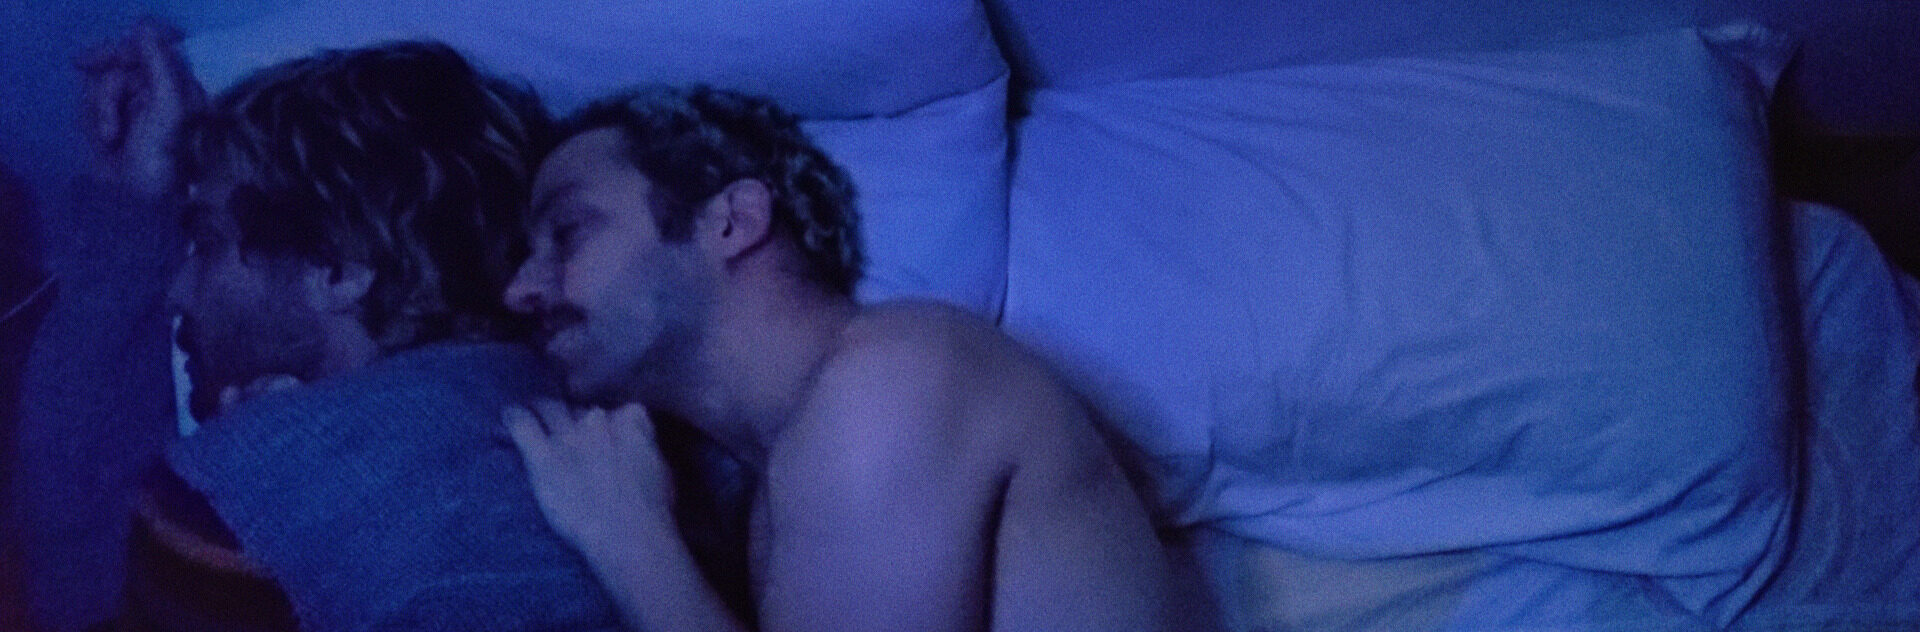 Desaprender a dormir